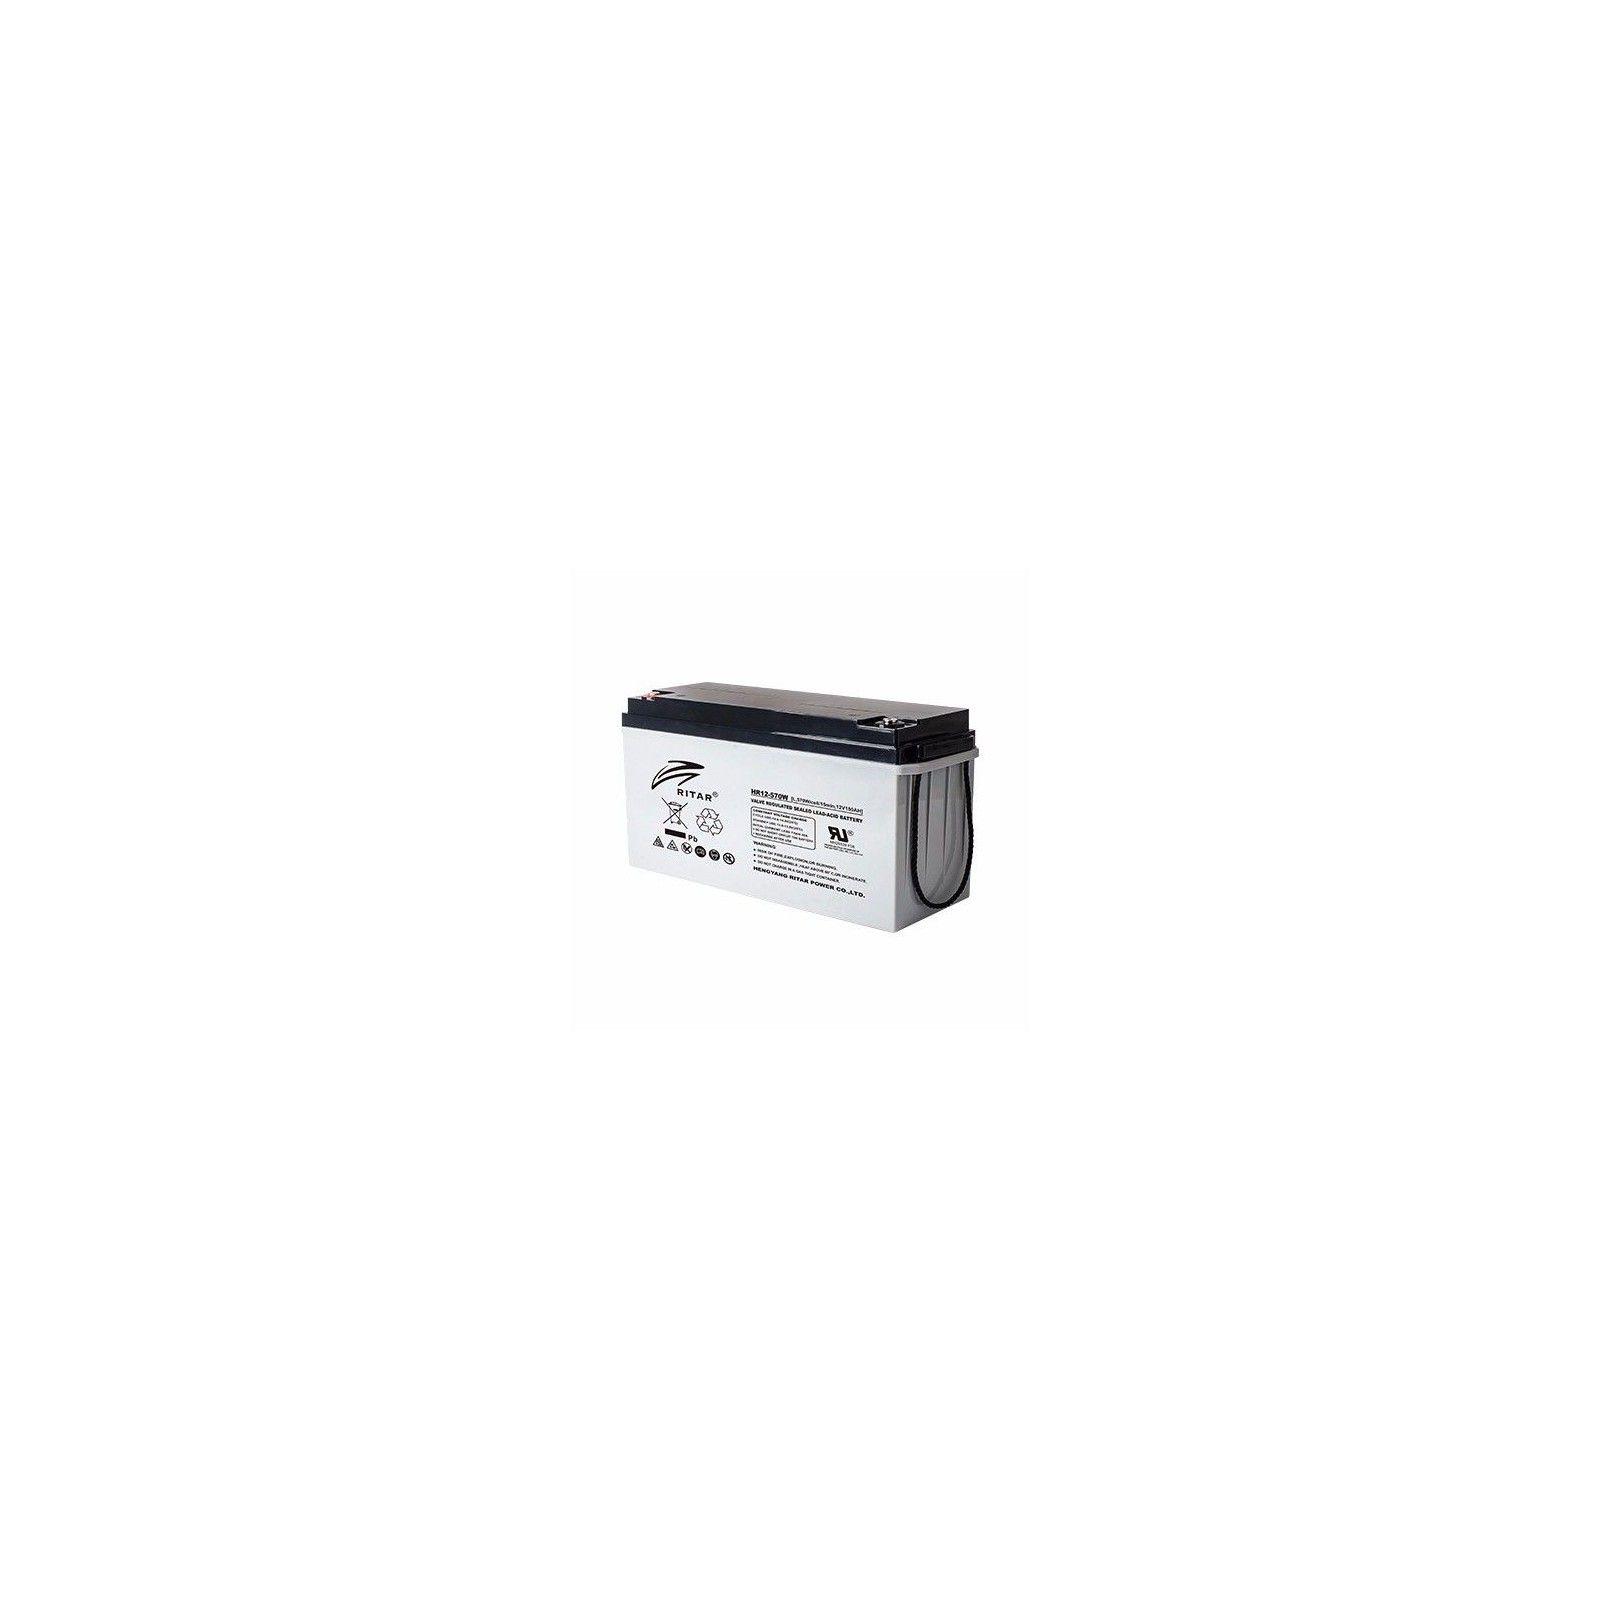 Batería Ritar HR12-32W 8Ah 12V Hr RITAR - 1